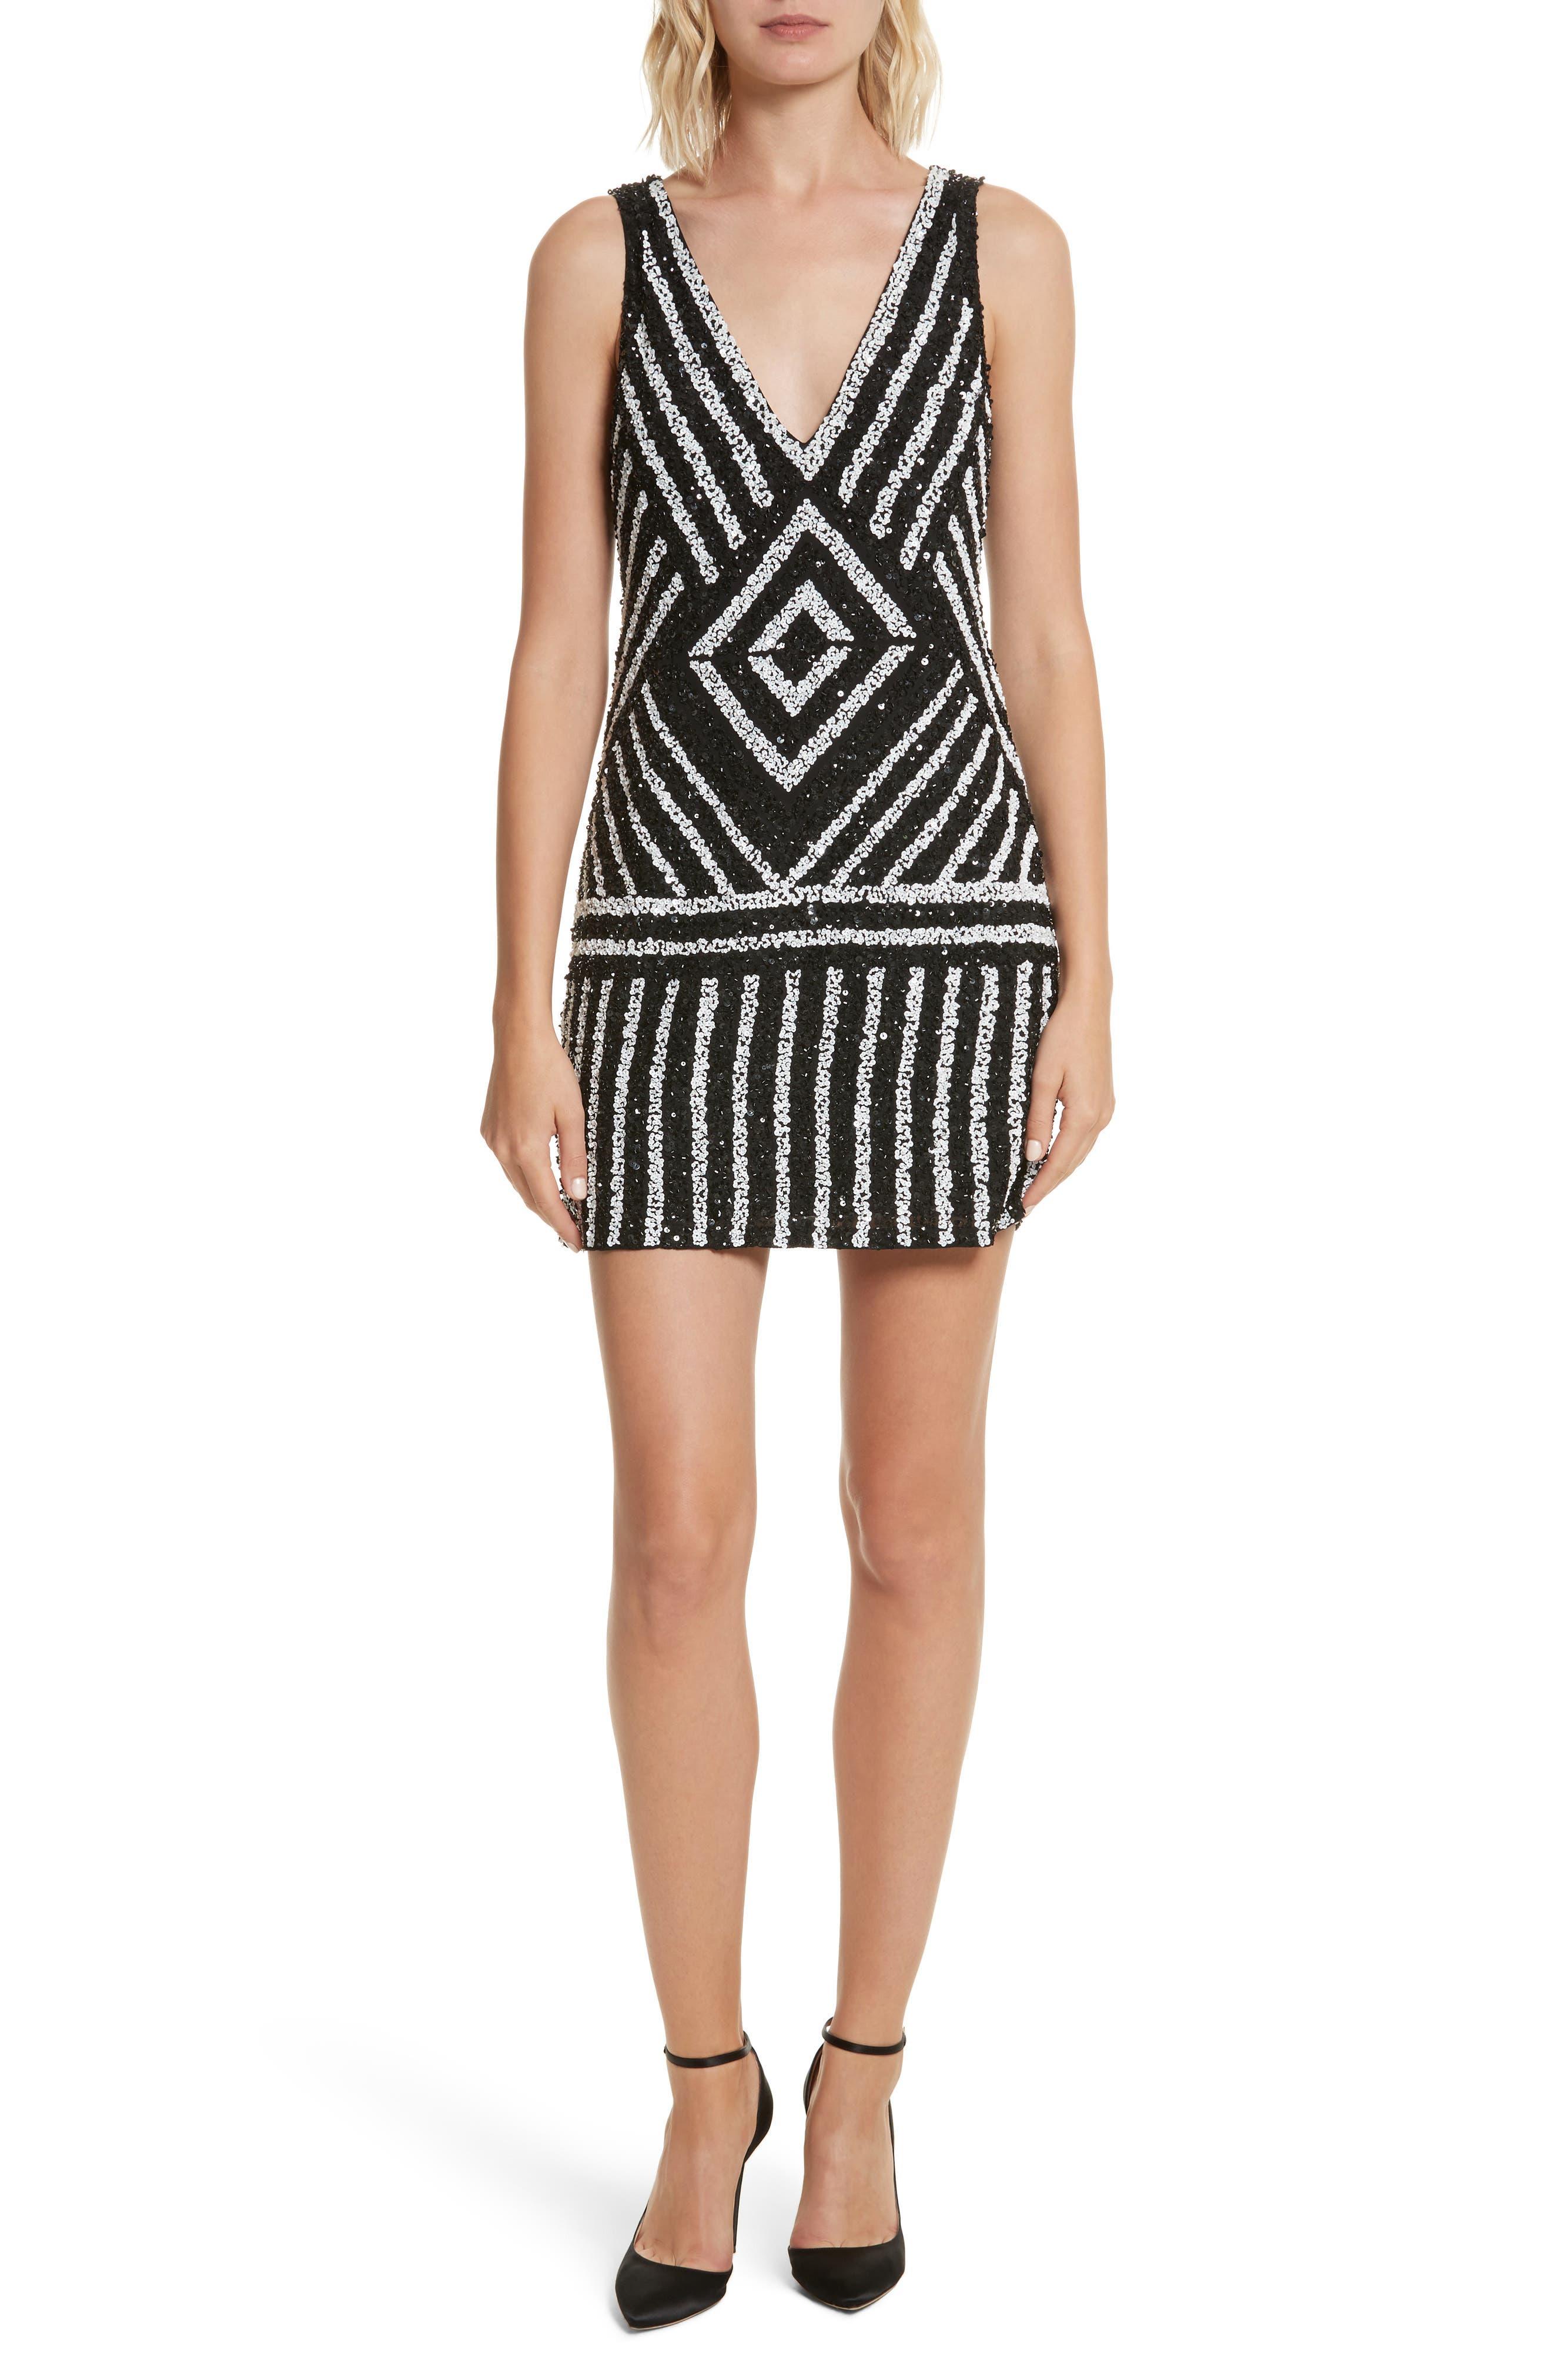 Venetia Embellished Shift Dress,                         Main,                         color, Black/ White